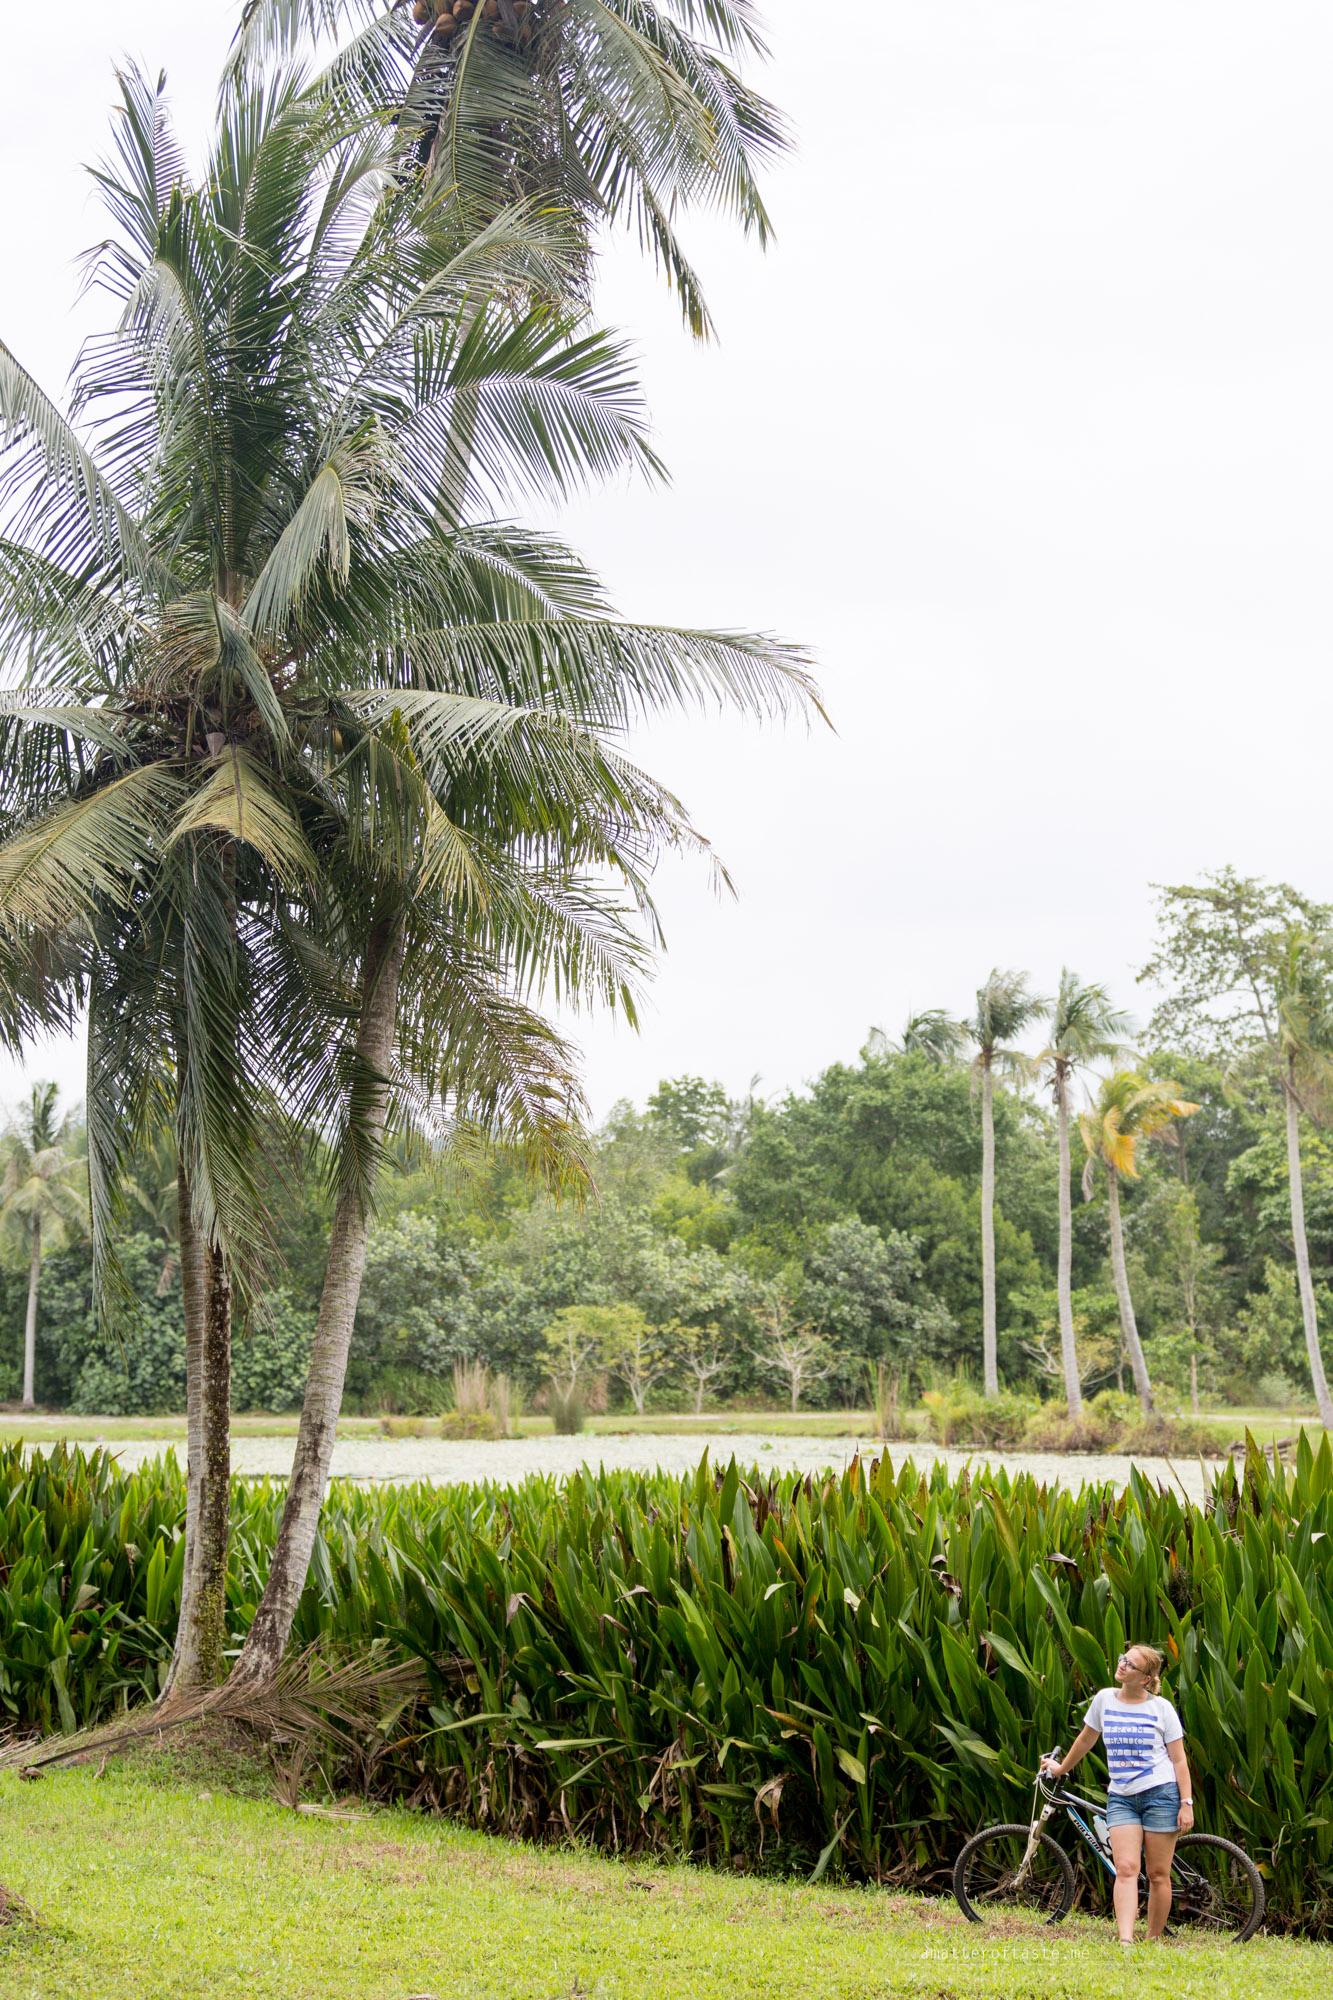 02-Pulau-Ubin-palm-trees